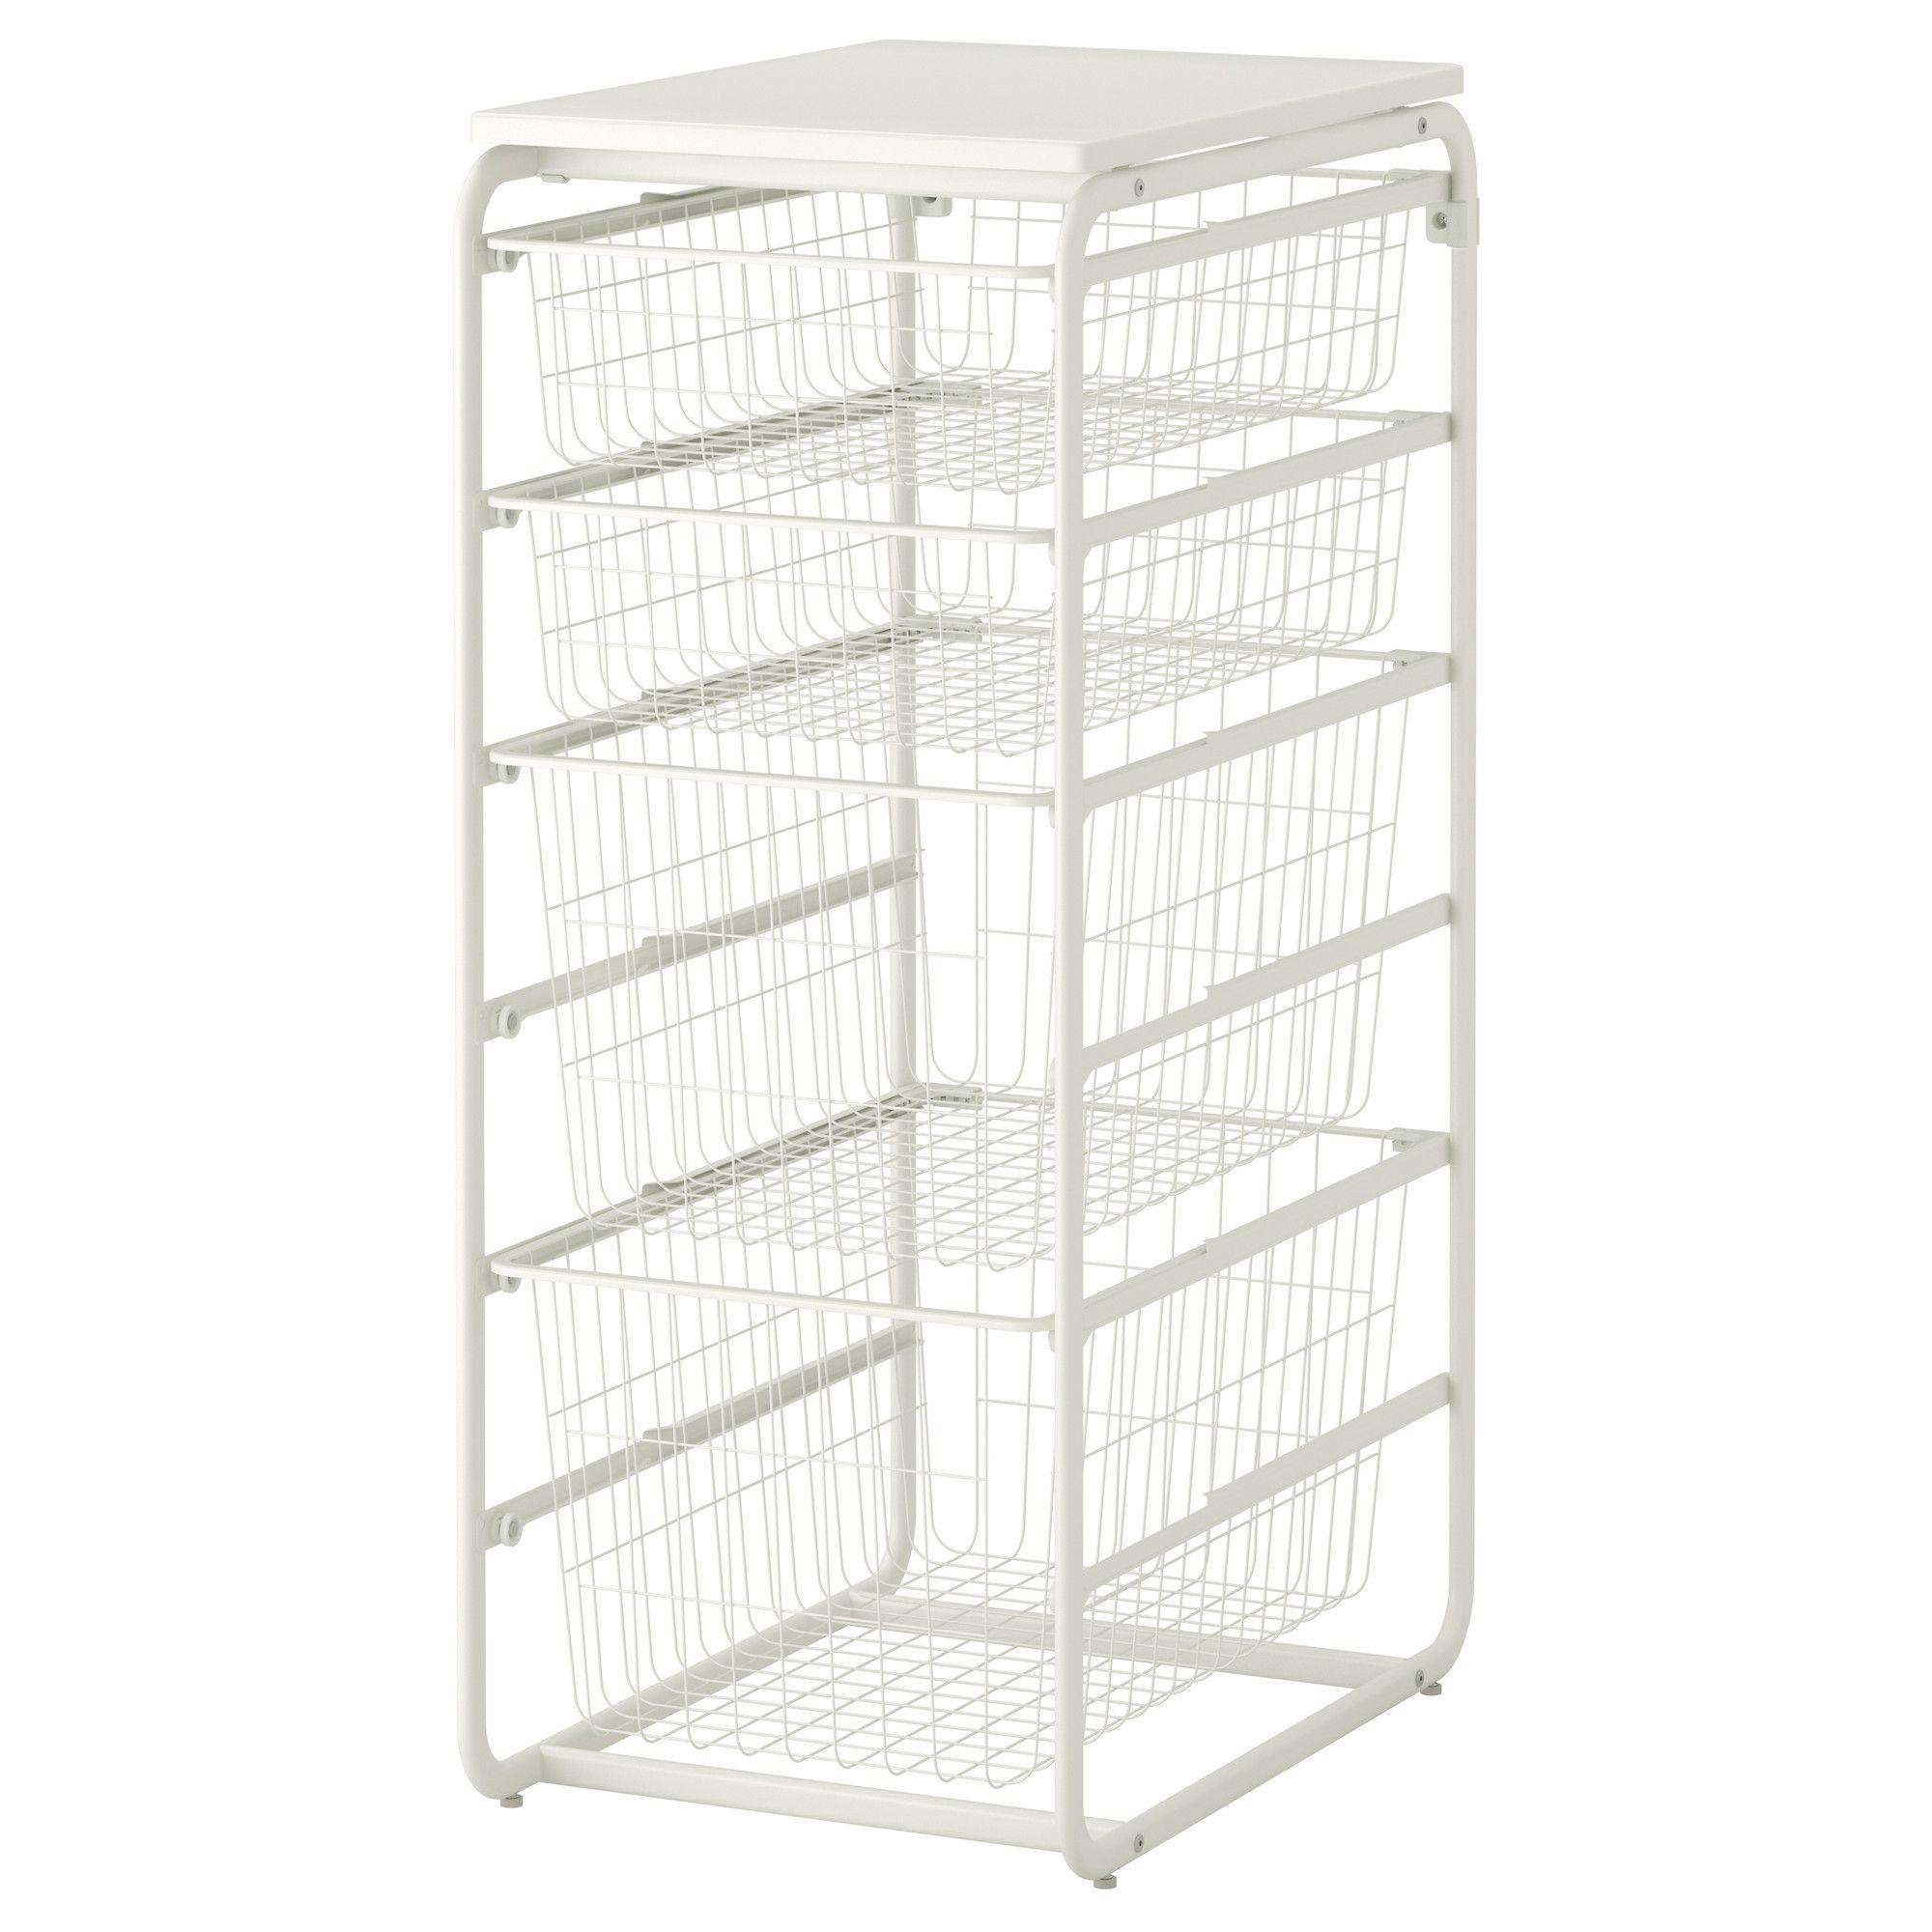 Algot Frame With 4 Wire Baskets Top Shelf